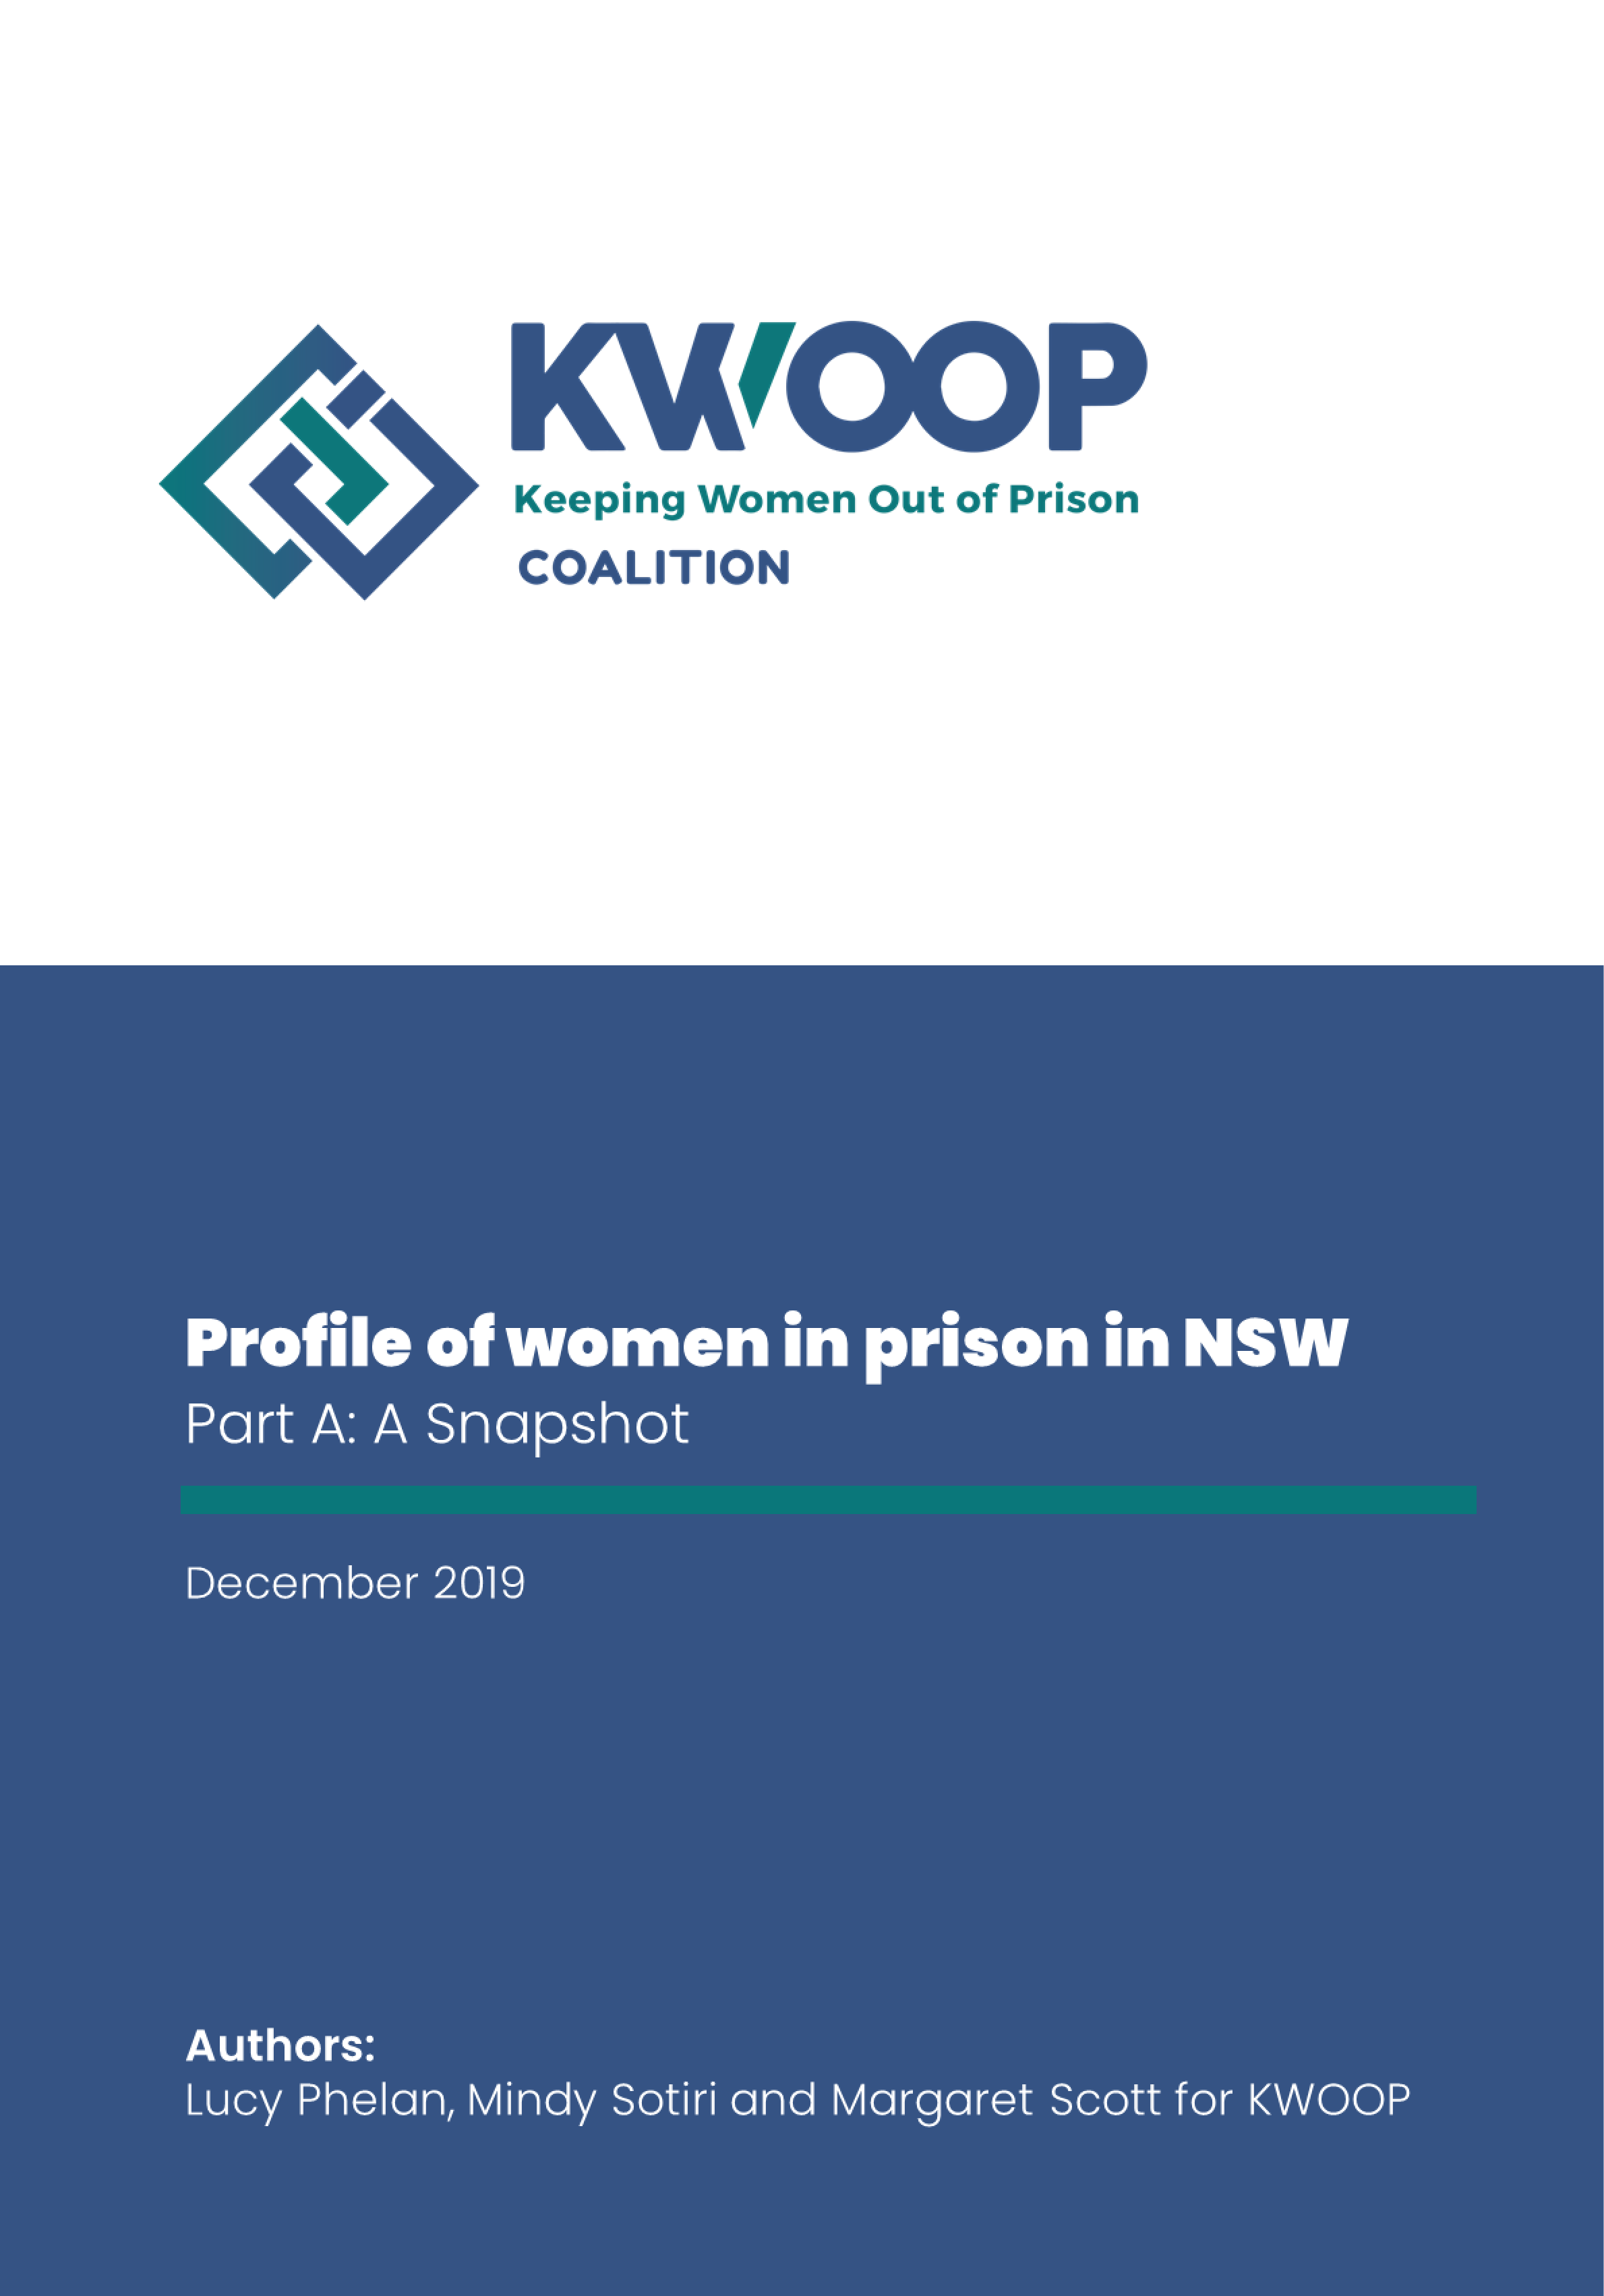 Keeping Women Out of Prison, June Oscar, Prison NSW, Women Prison NSW, Justice NSW, Rosalind Strong,